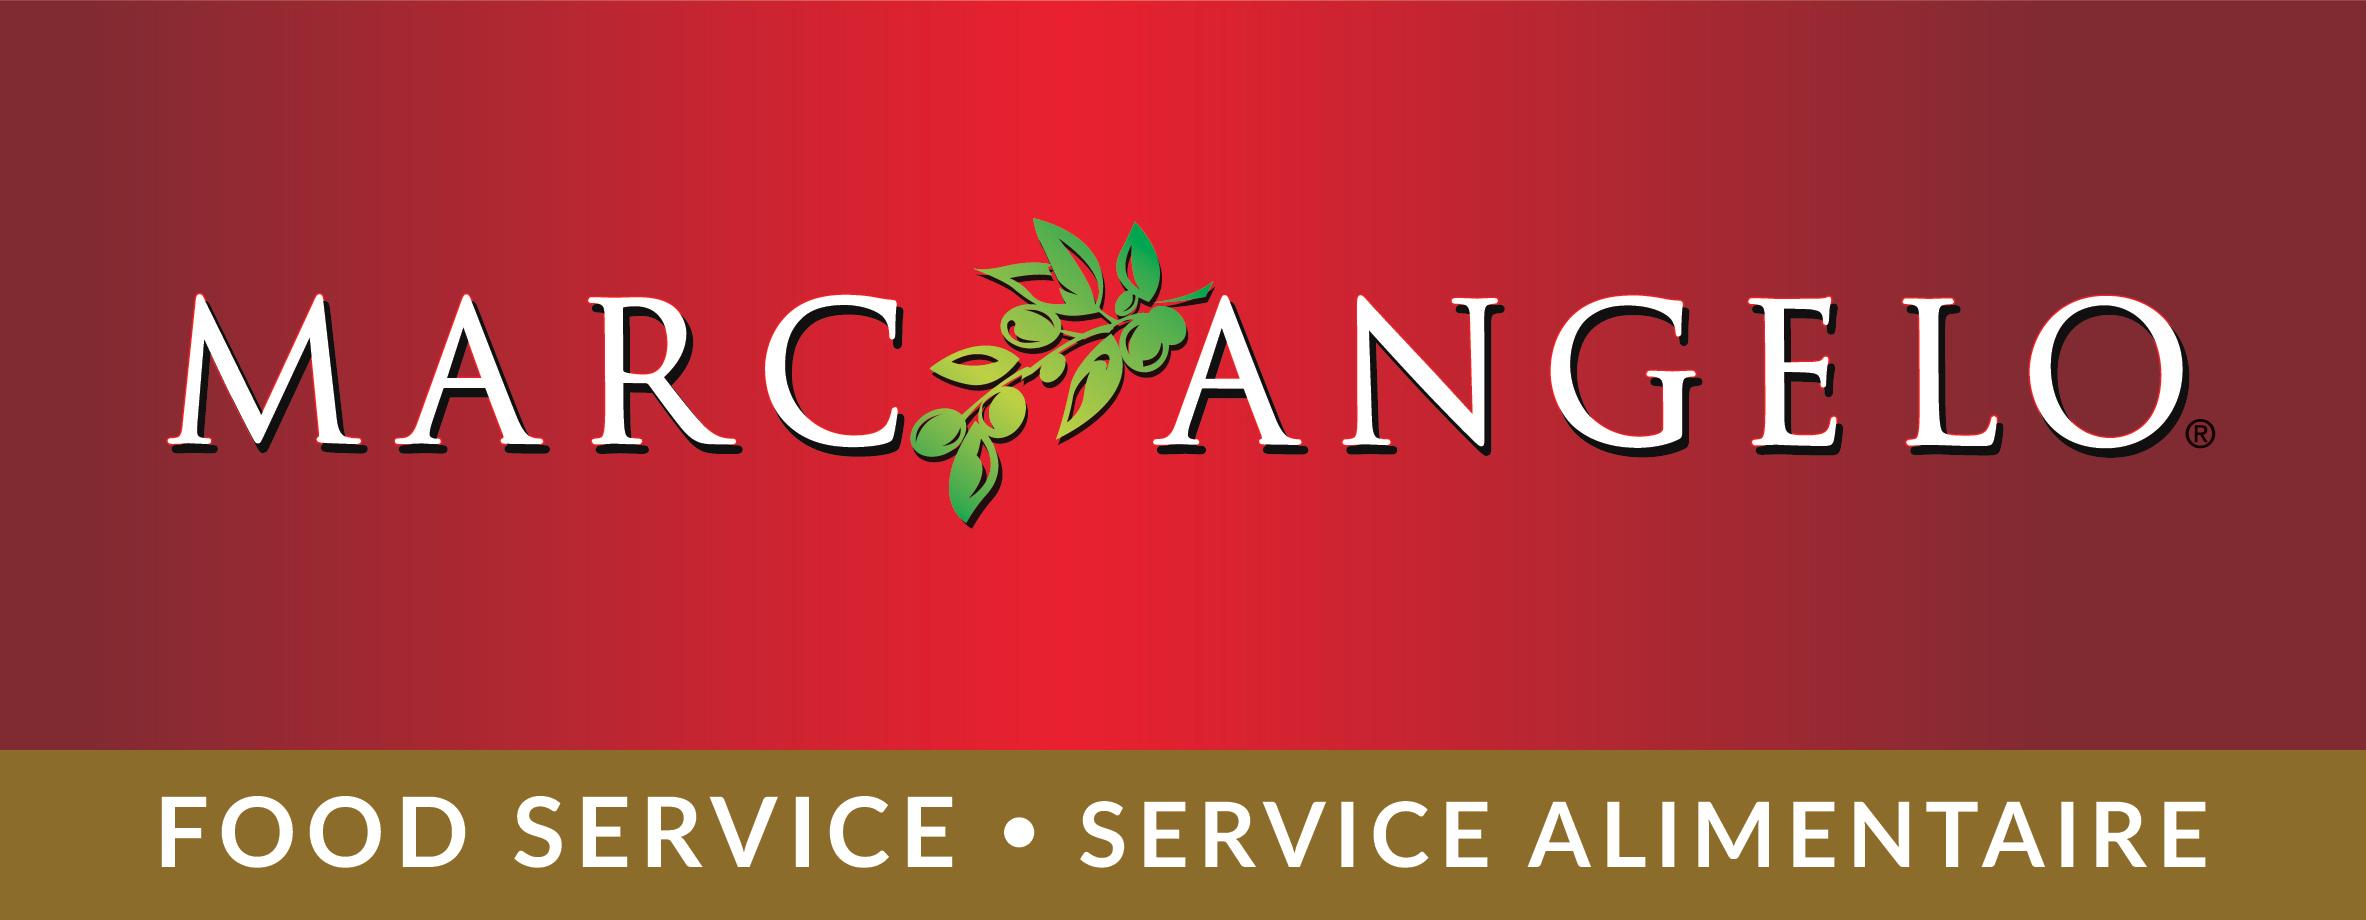 Marcangelo Food Service logo